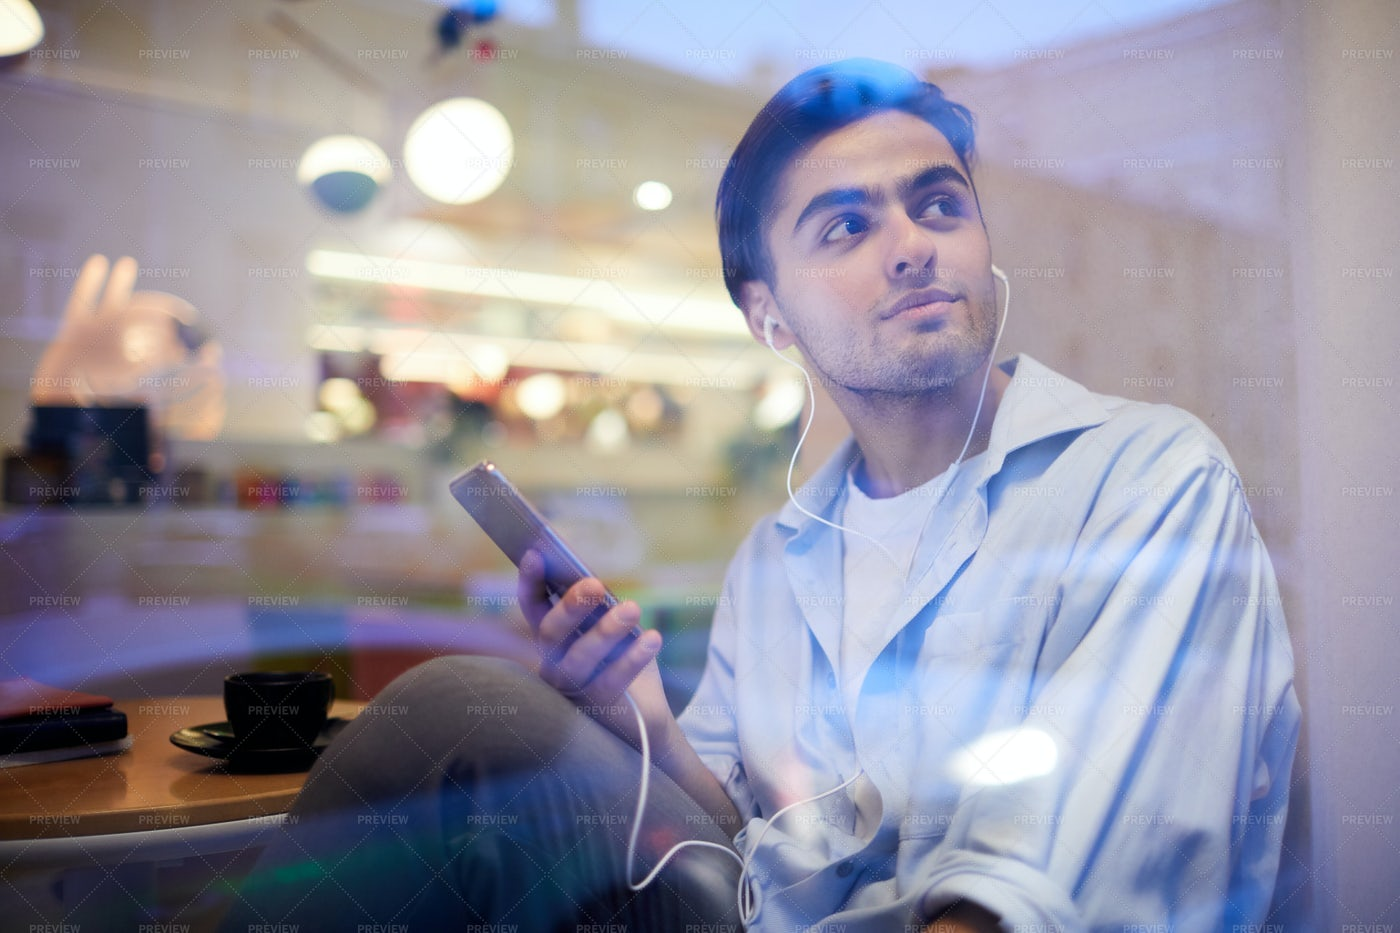 Guy Listening To Music: Stock Photos